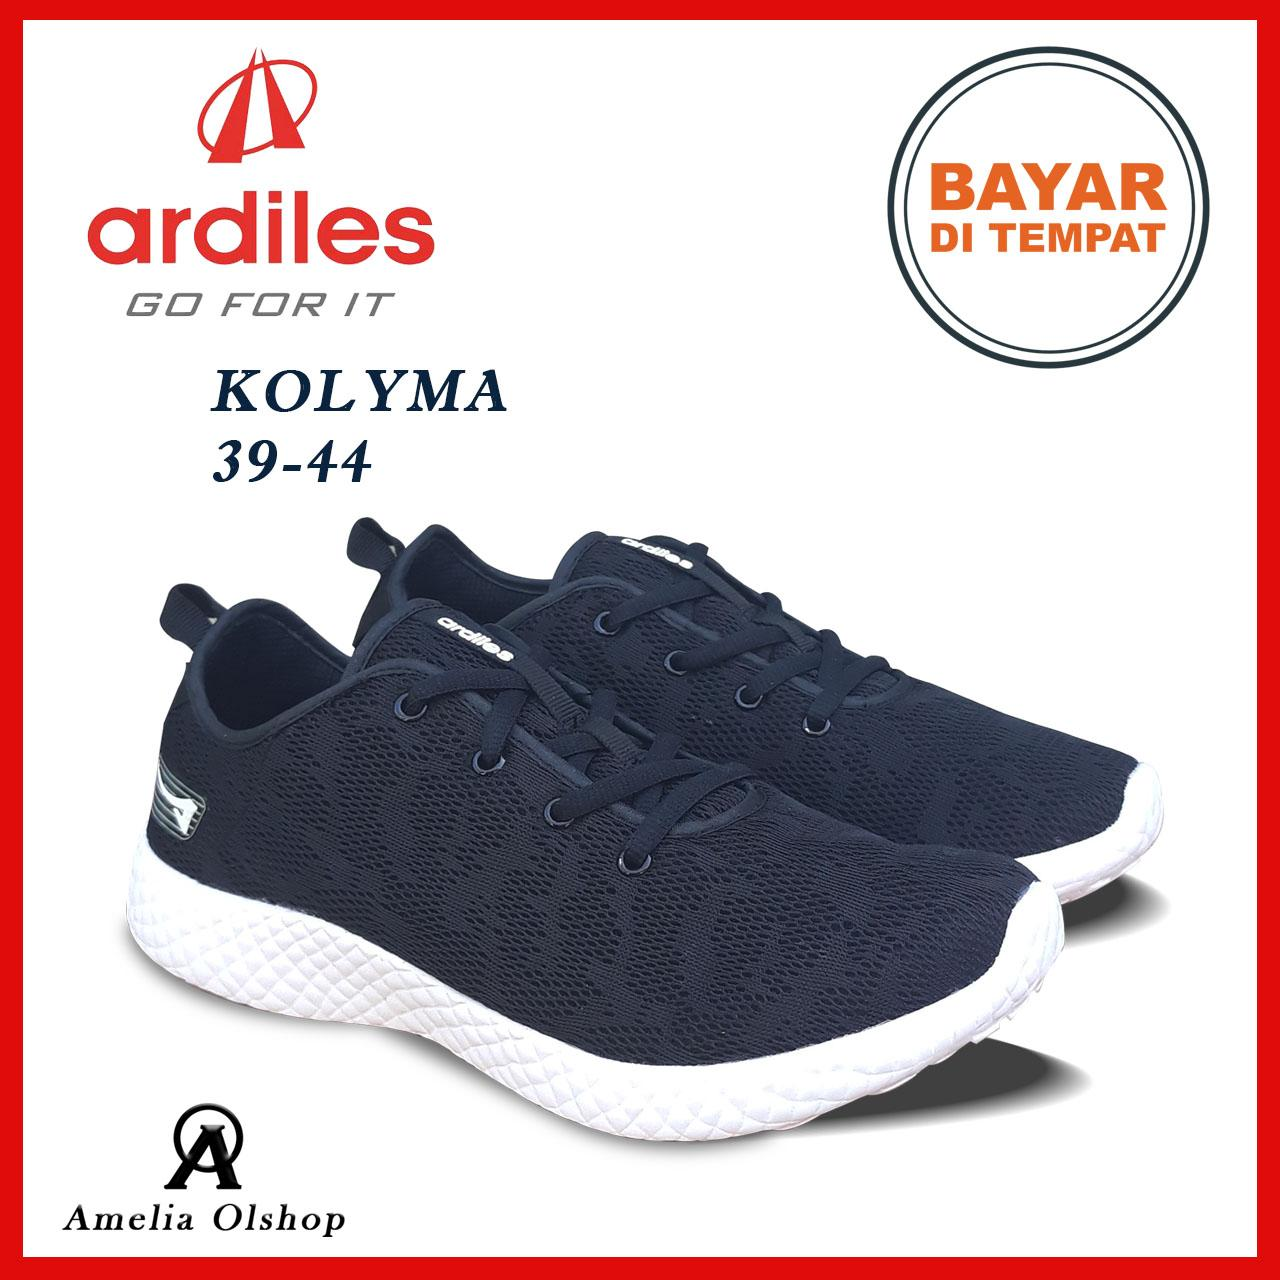 Buy Sell Cheapest Mrg 7391 Brpm Best Quality Product Deals Sepatu Casual Sneakers Pria 7215 Black Amelia Olshop Kolyma 39 44